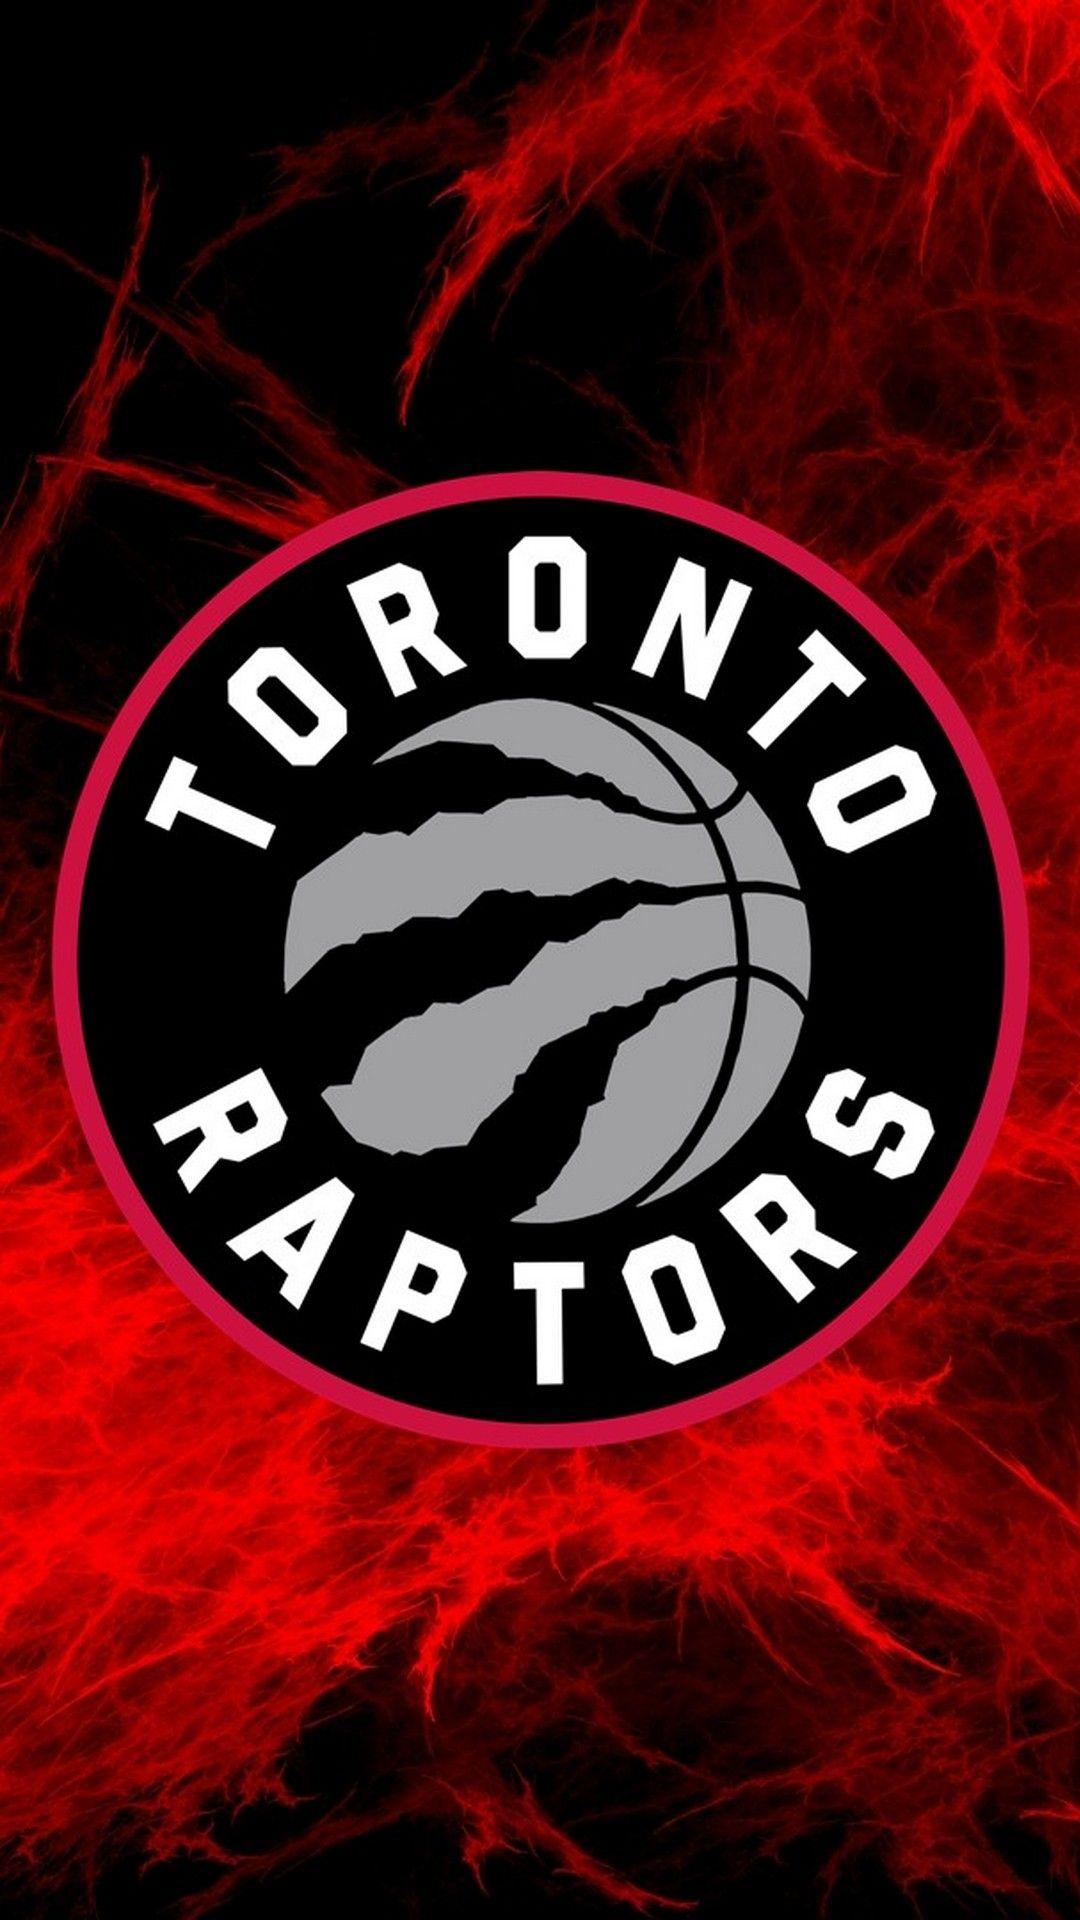 Toronto Raptors Wallpaper For Android Best Mobile Wallpaper Raptors Wallpaper Toronto Raptors Raptors